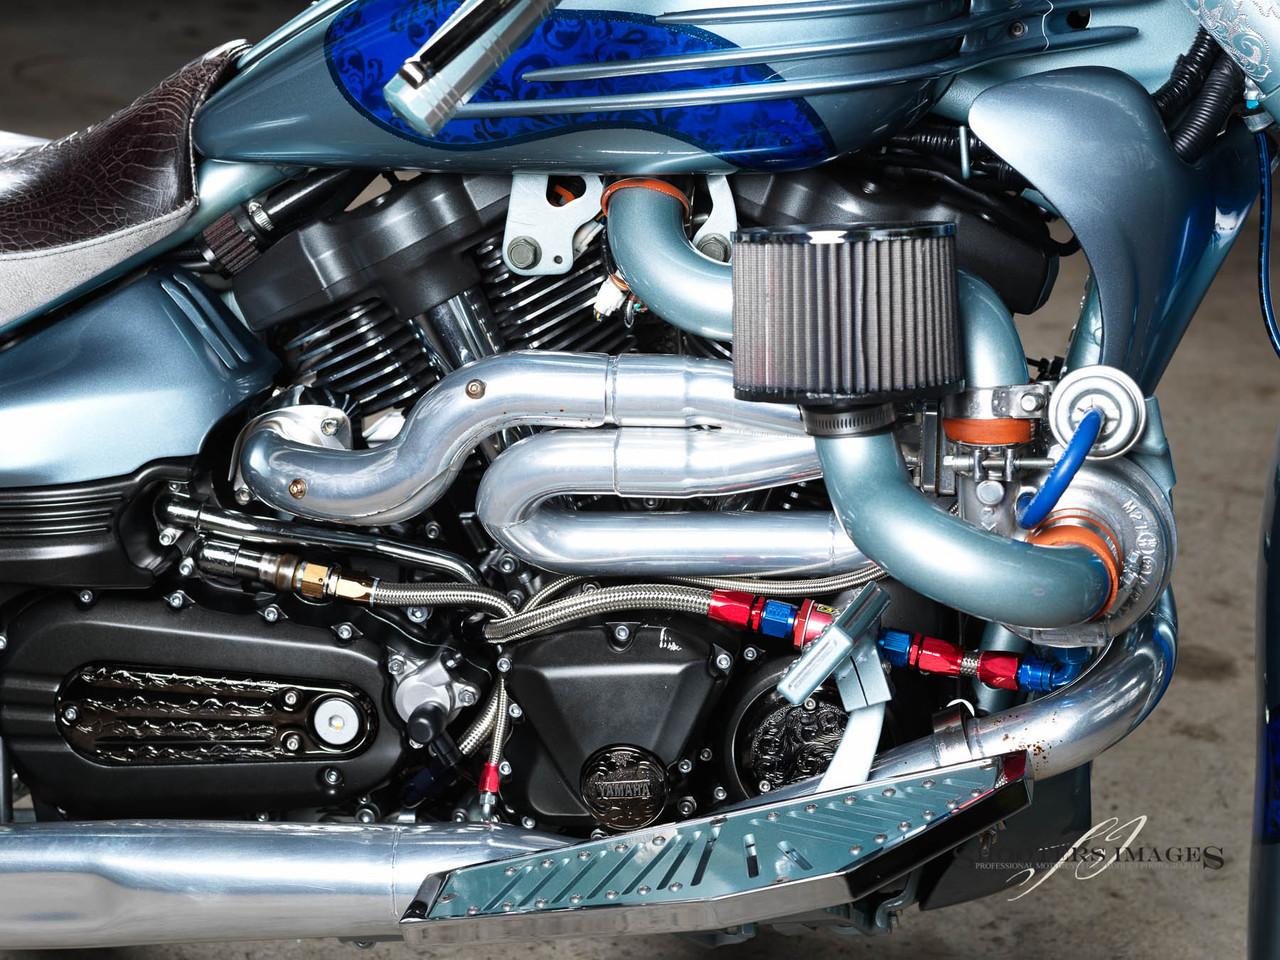 Blacksmith Anvil 118 CI Turbo Stage 1 Big Bore kit XV1900 Roadliner,  Stratoliner, Raider